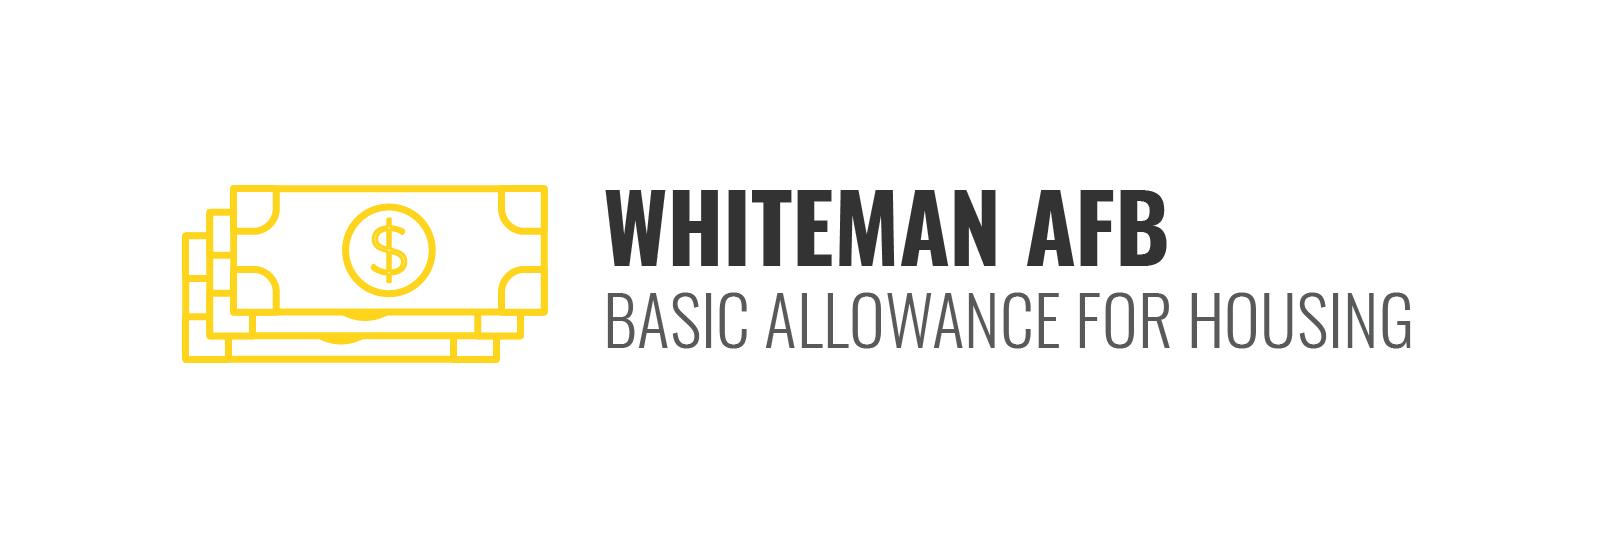 Whiteman AFB BAH